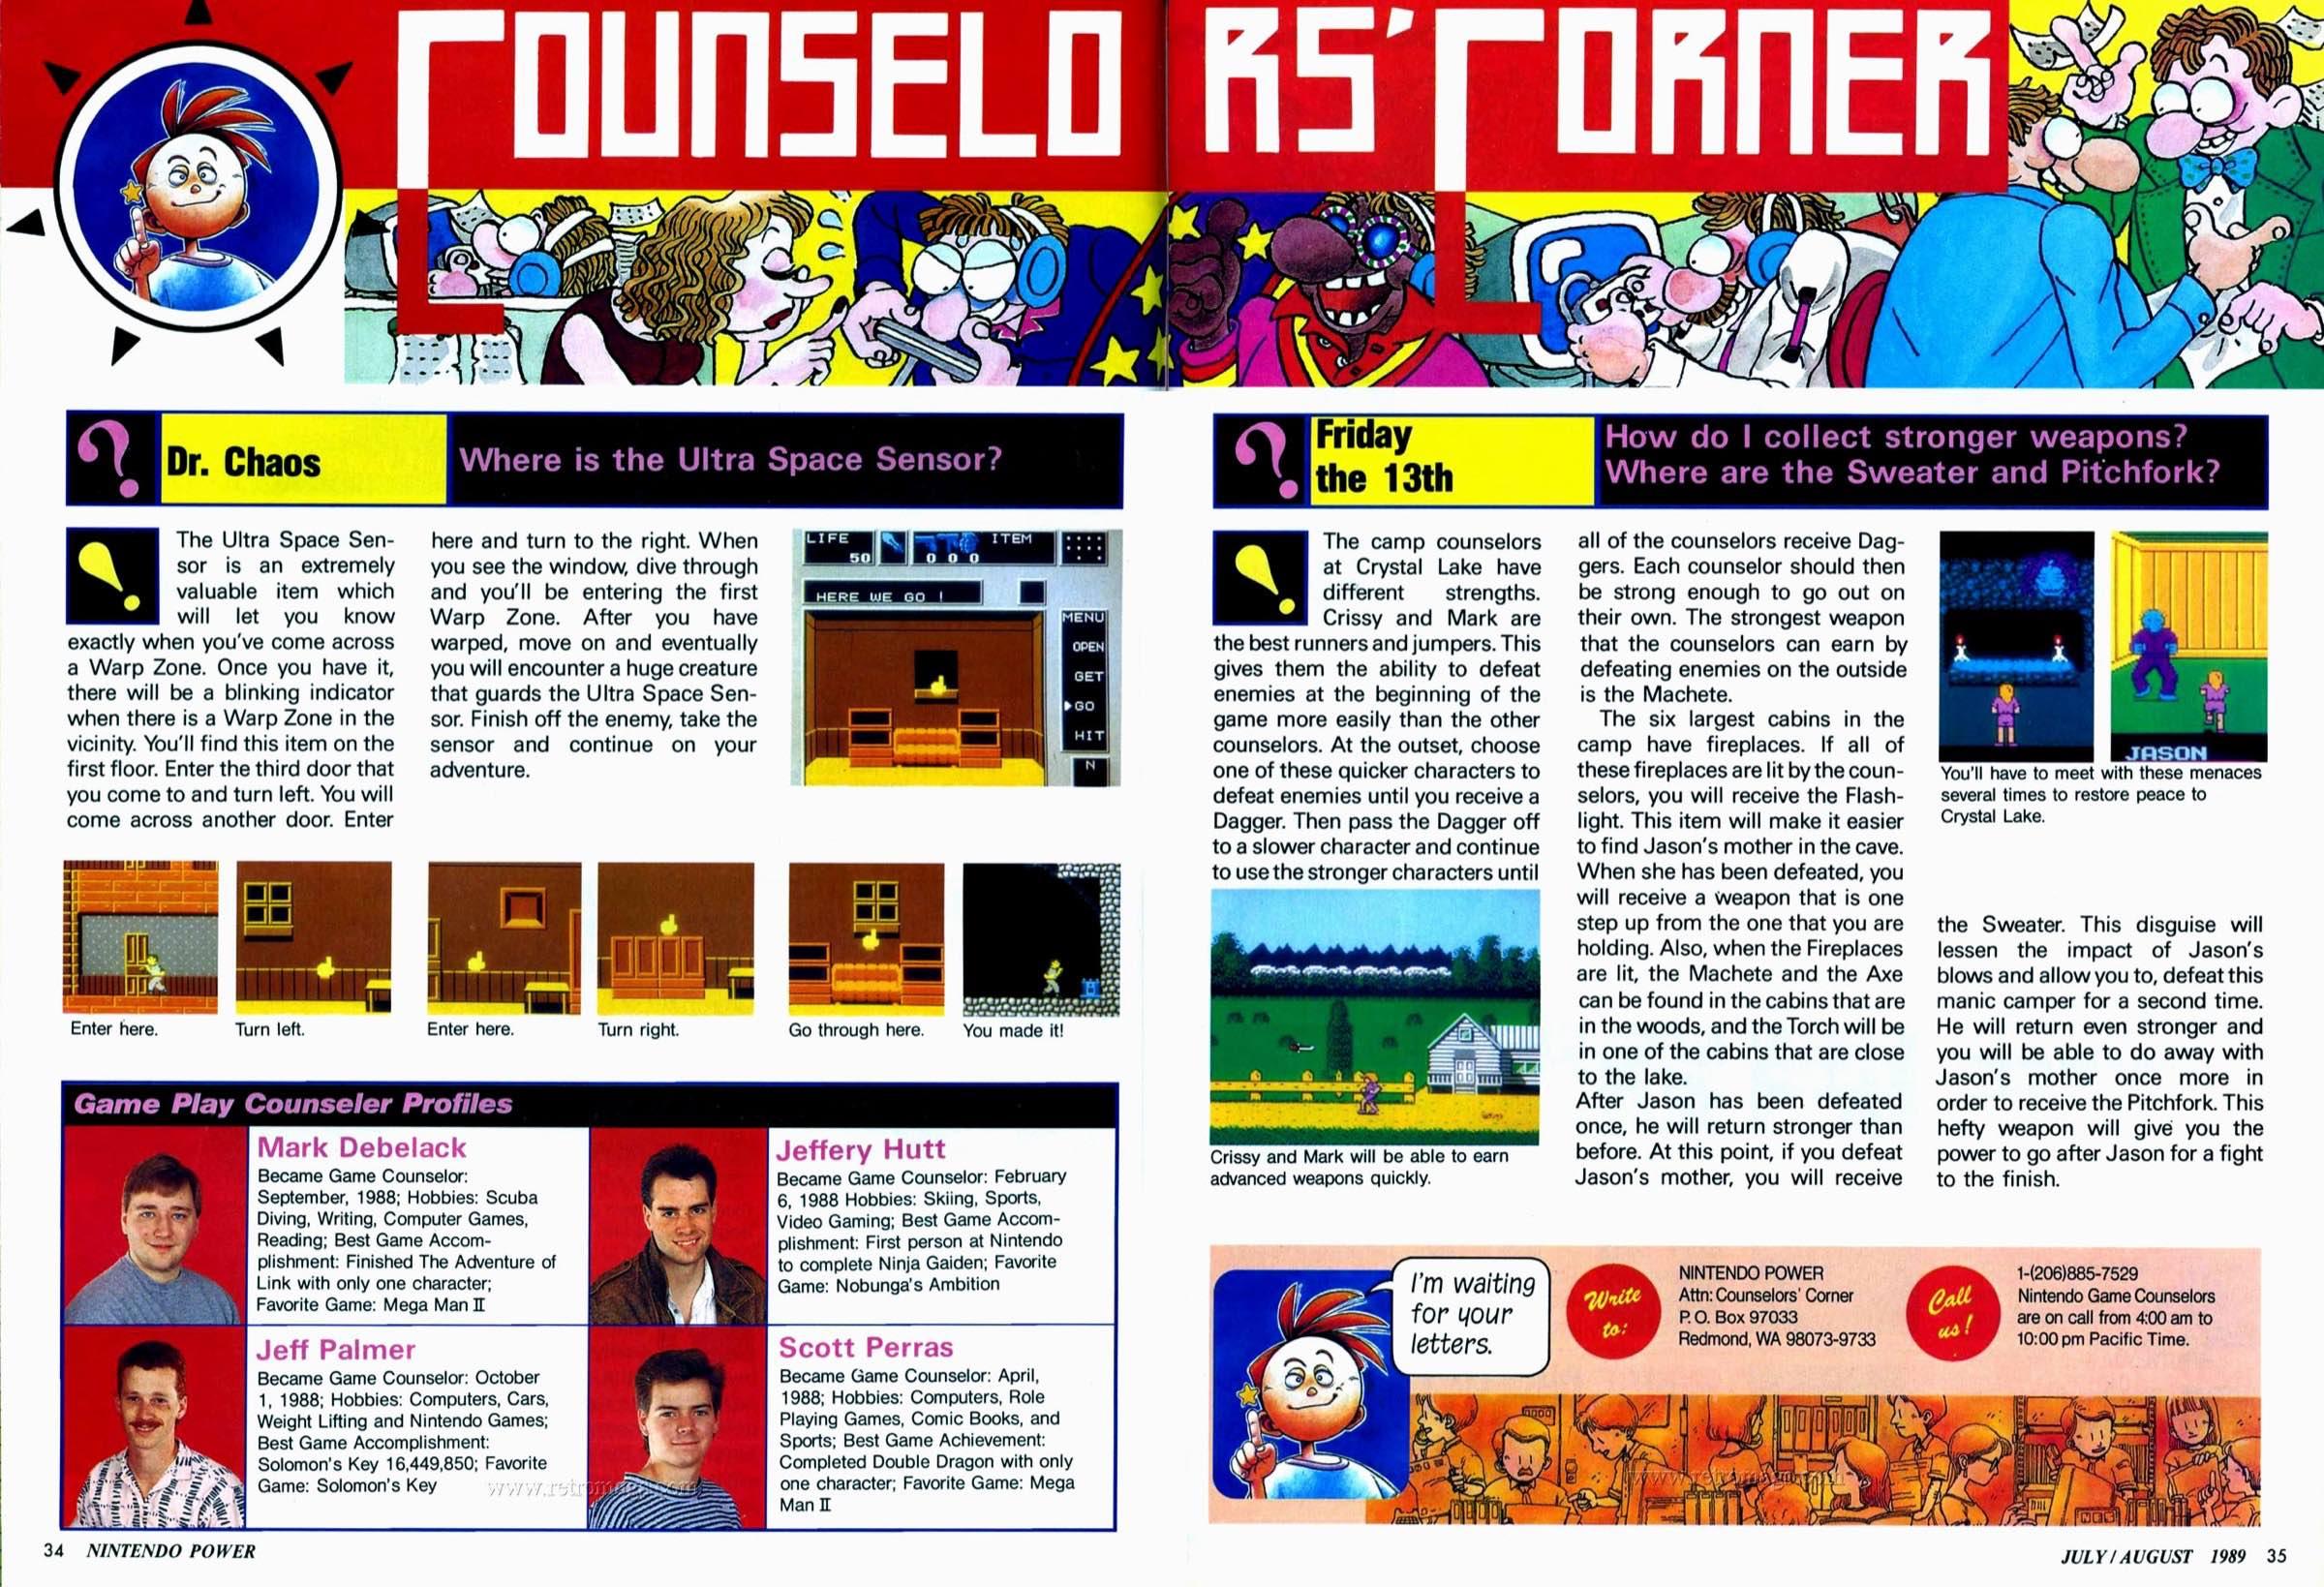 Nintendo Power | July August 1989 p34-35